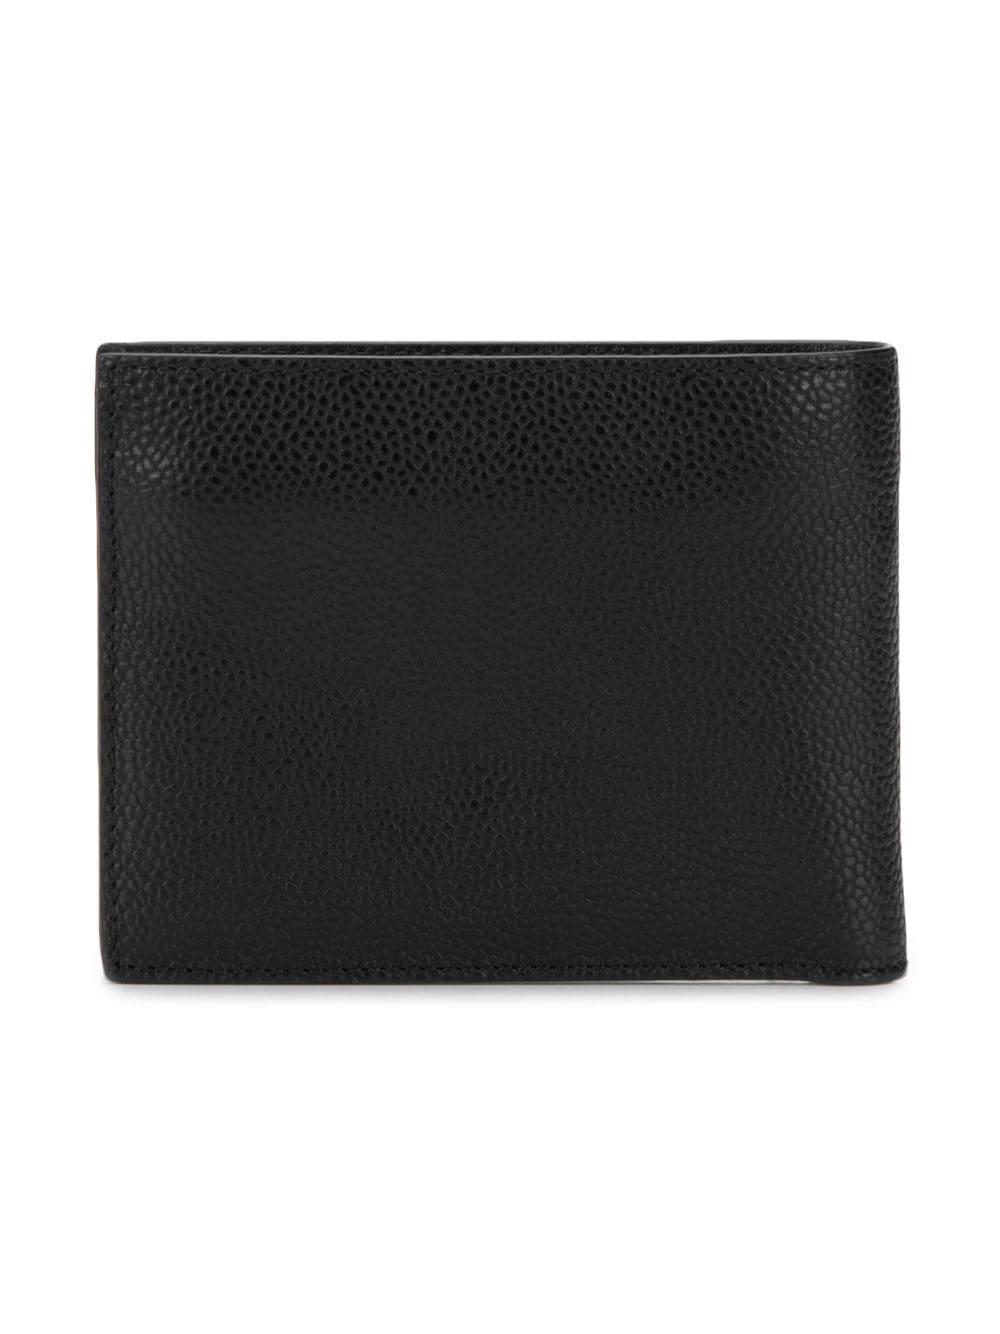 44bf455b1219 Lyst - Off-White c o Virgil Abloh Striped Wallet in Black for Men - Save 30%